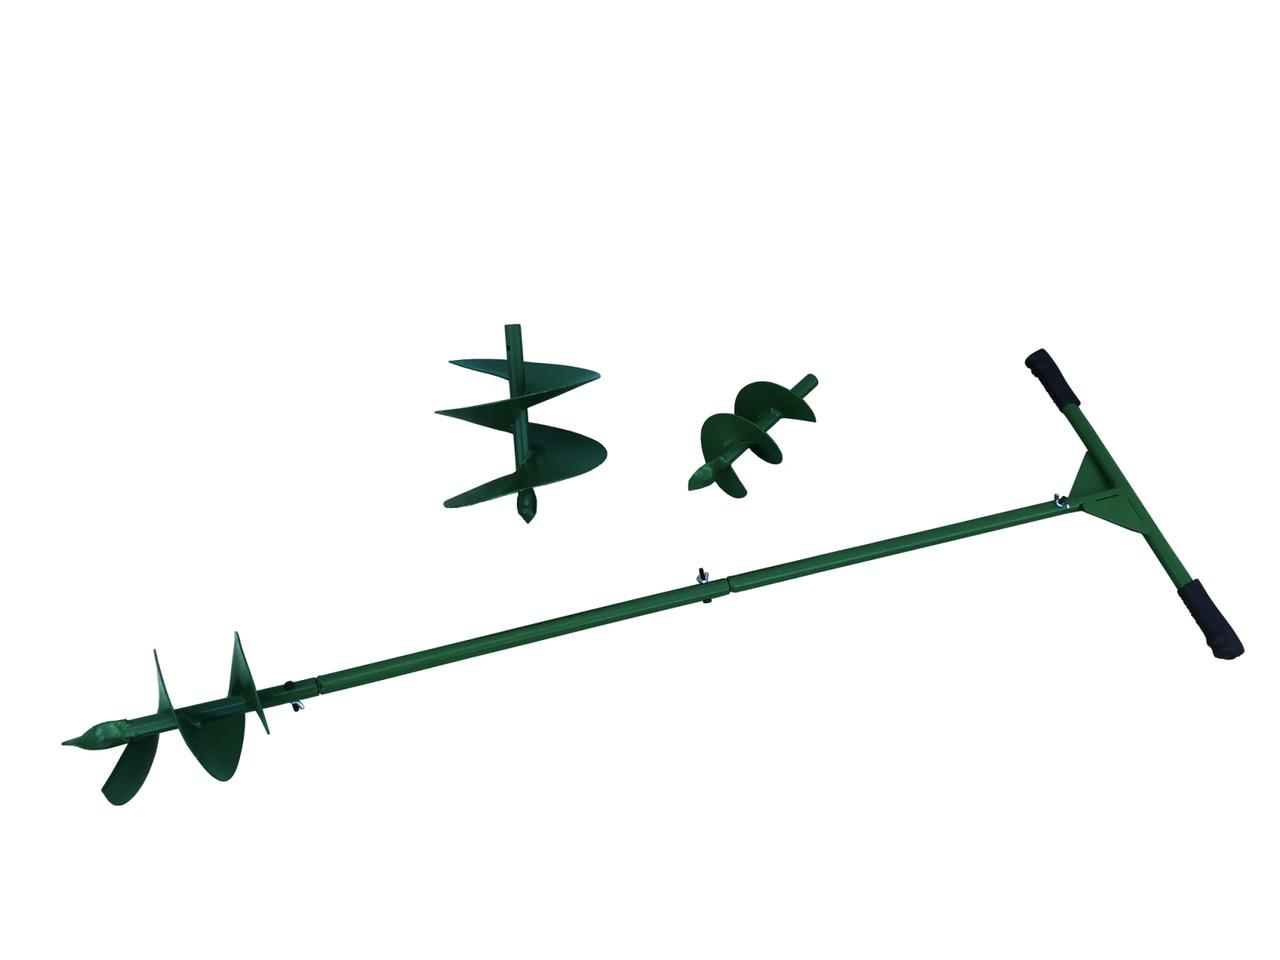 Бур шнековый Крот 3 насадки (120/170/220 мм)